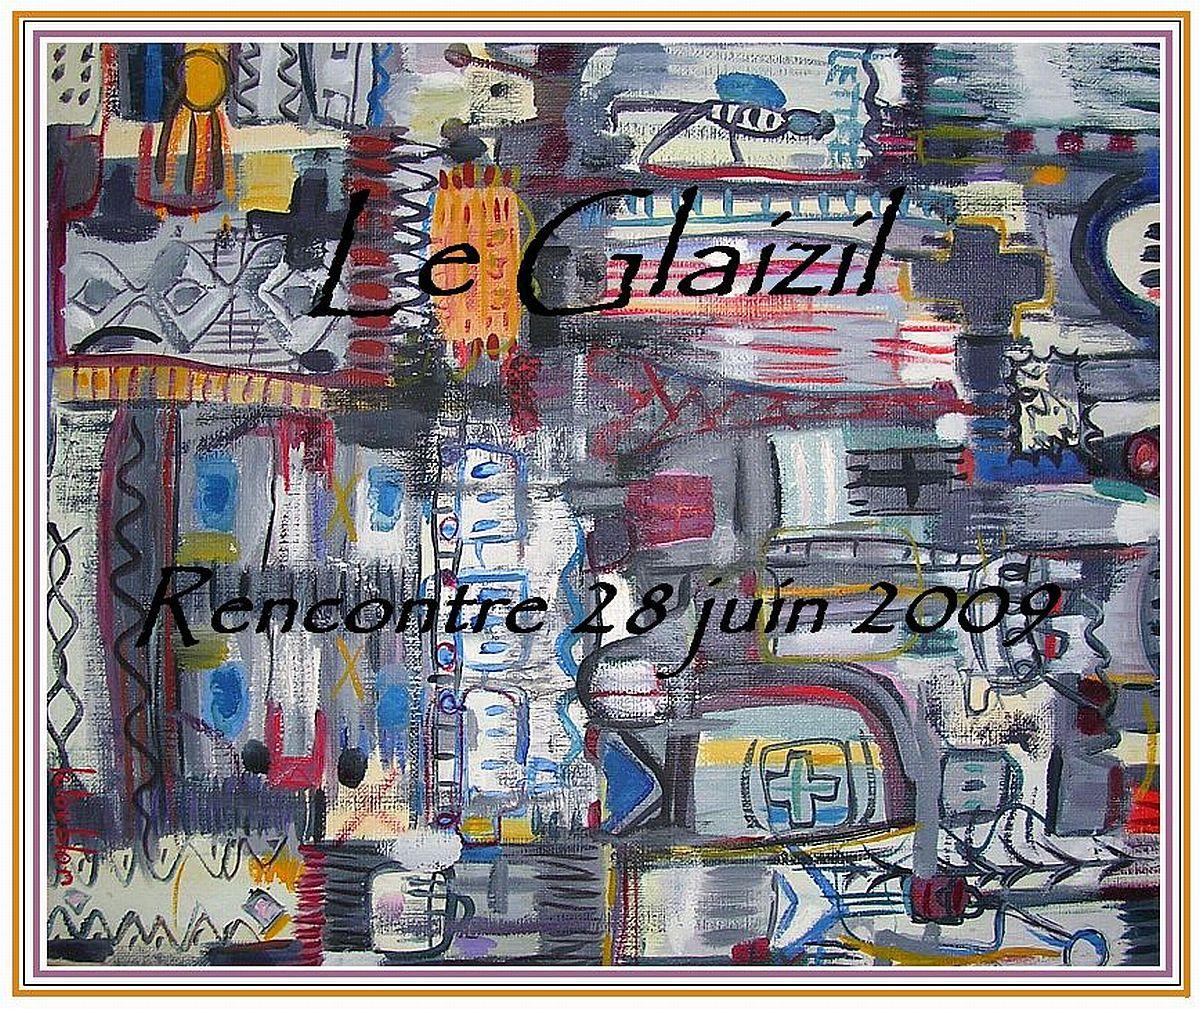 Rencontre a xv 28 juin 2015